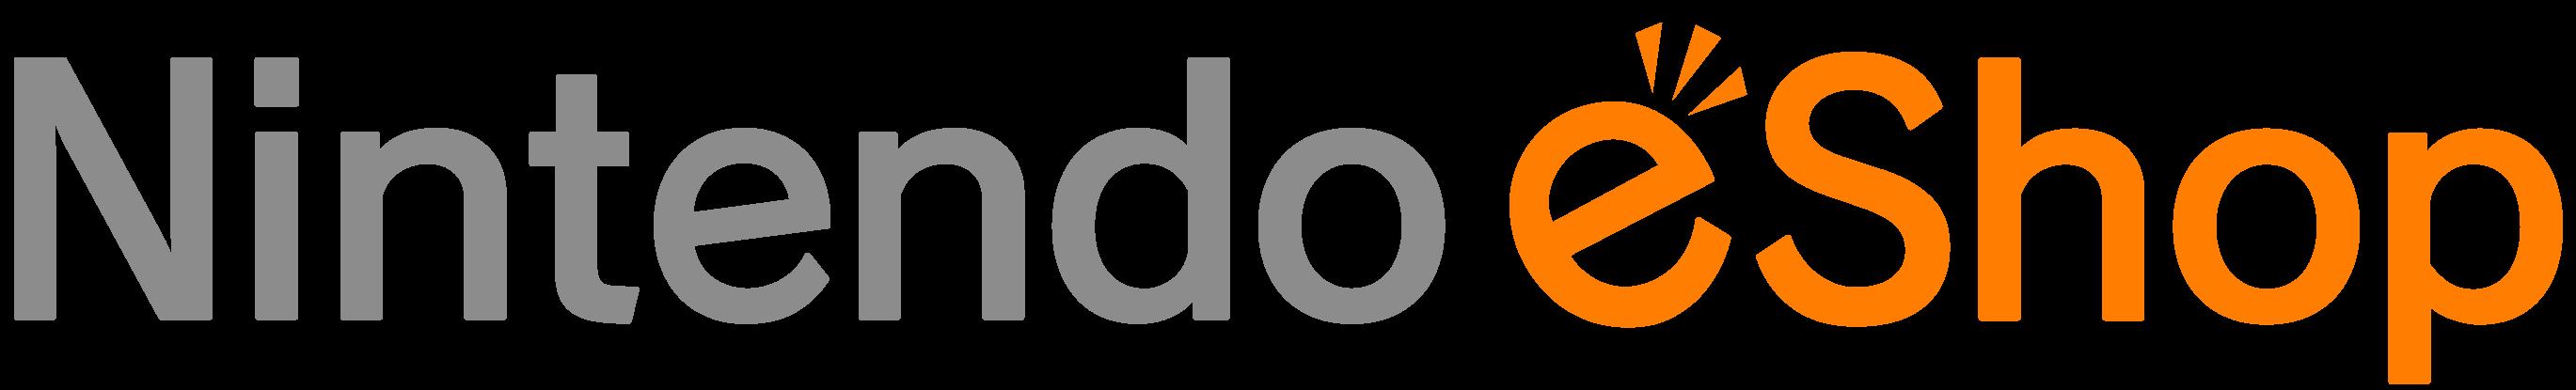 Nintendo_eShop_logo2